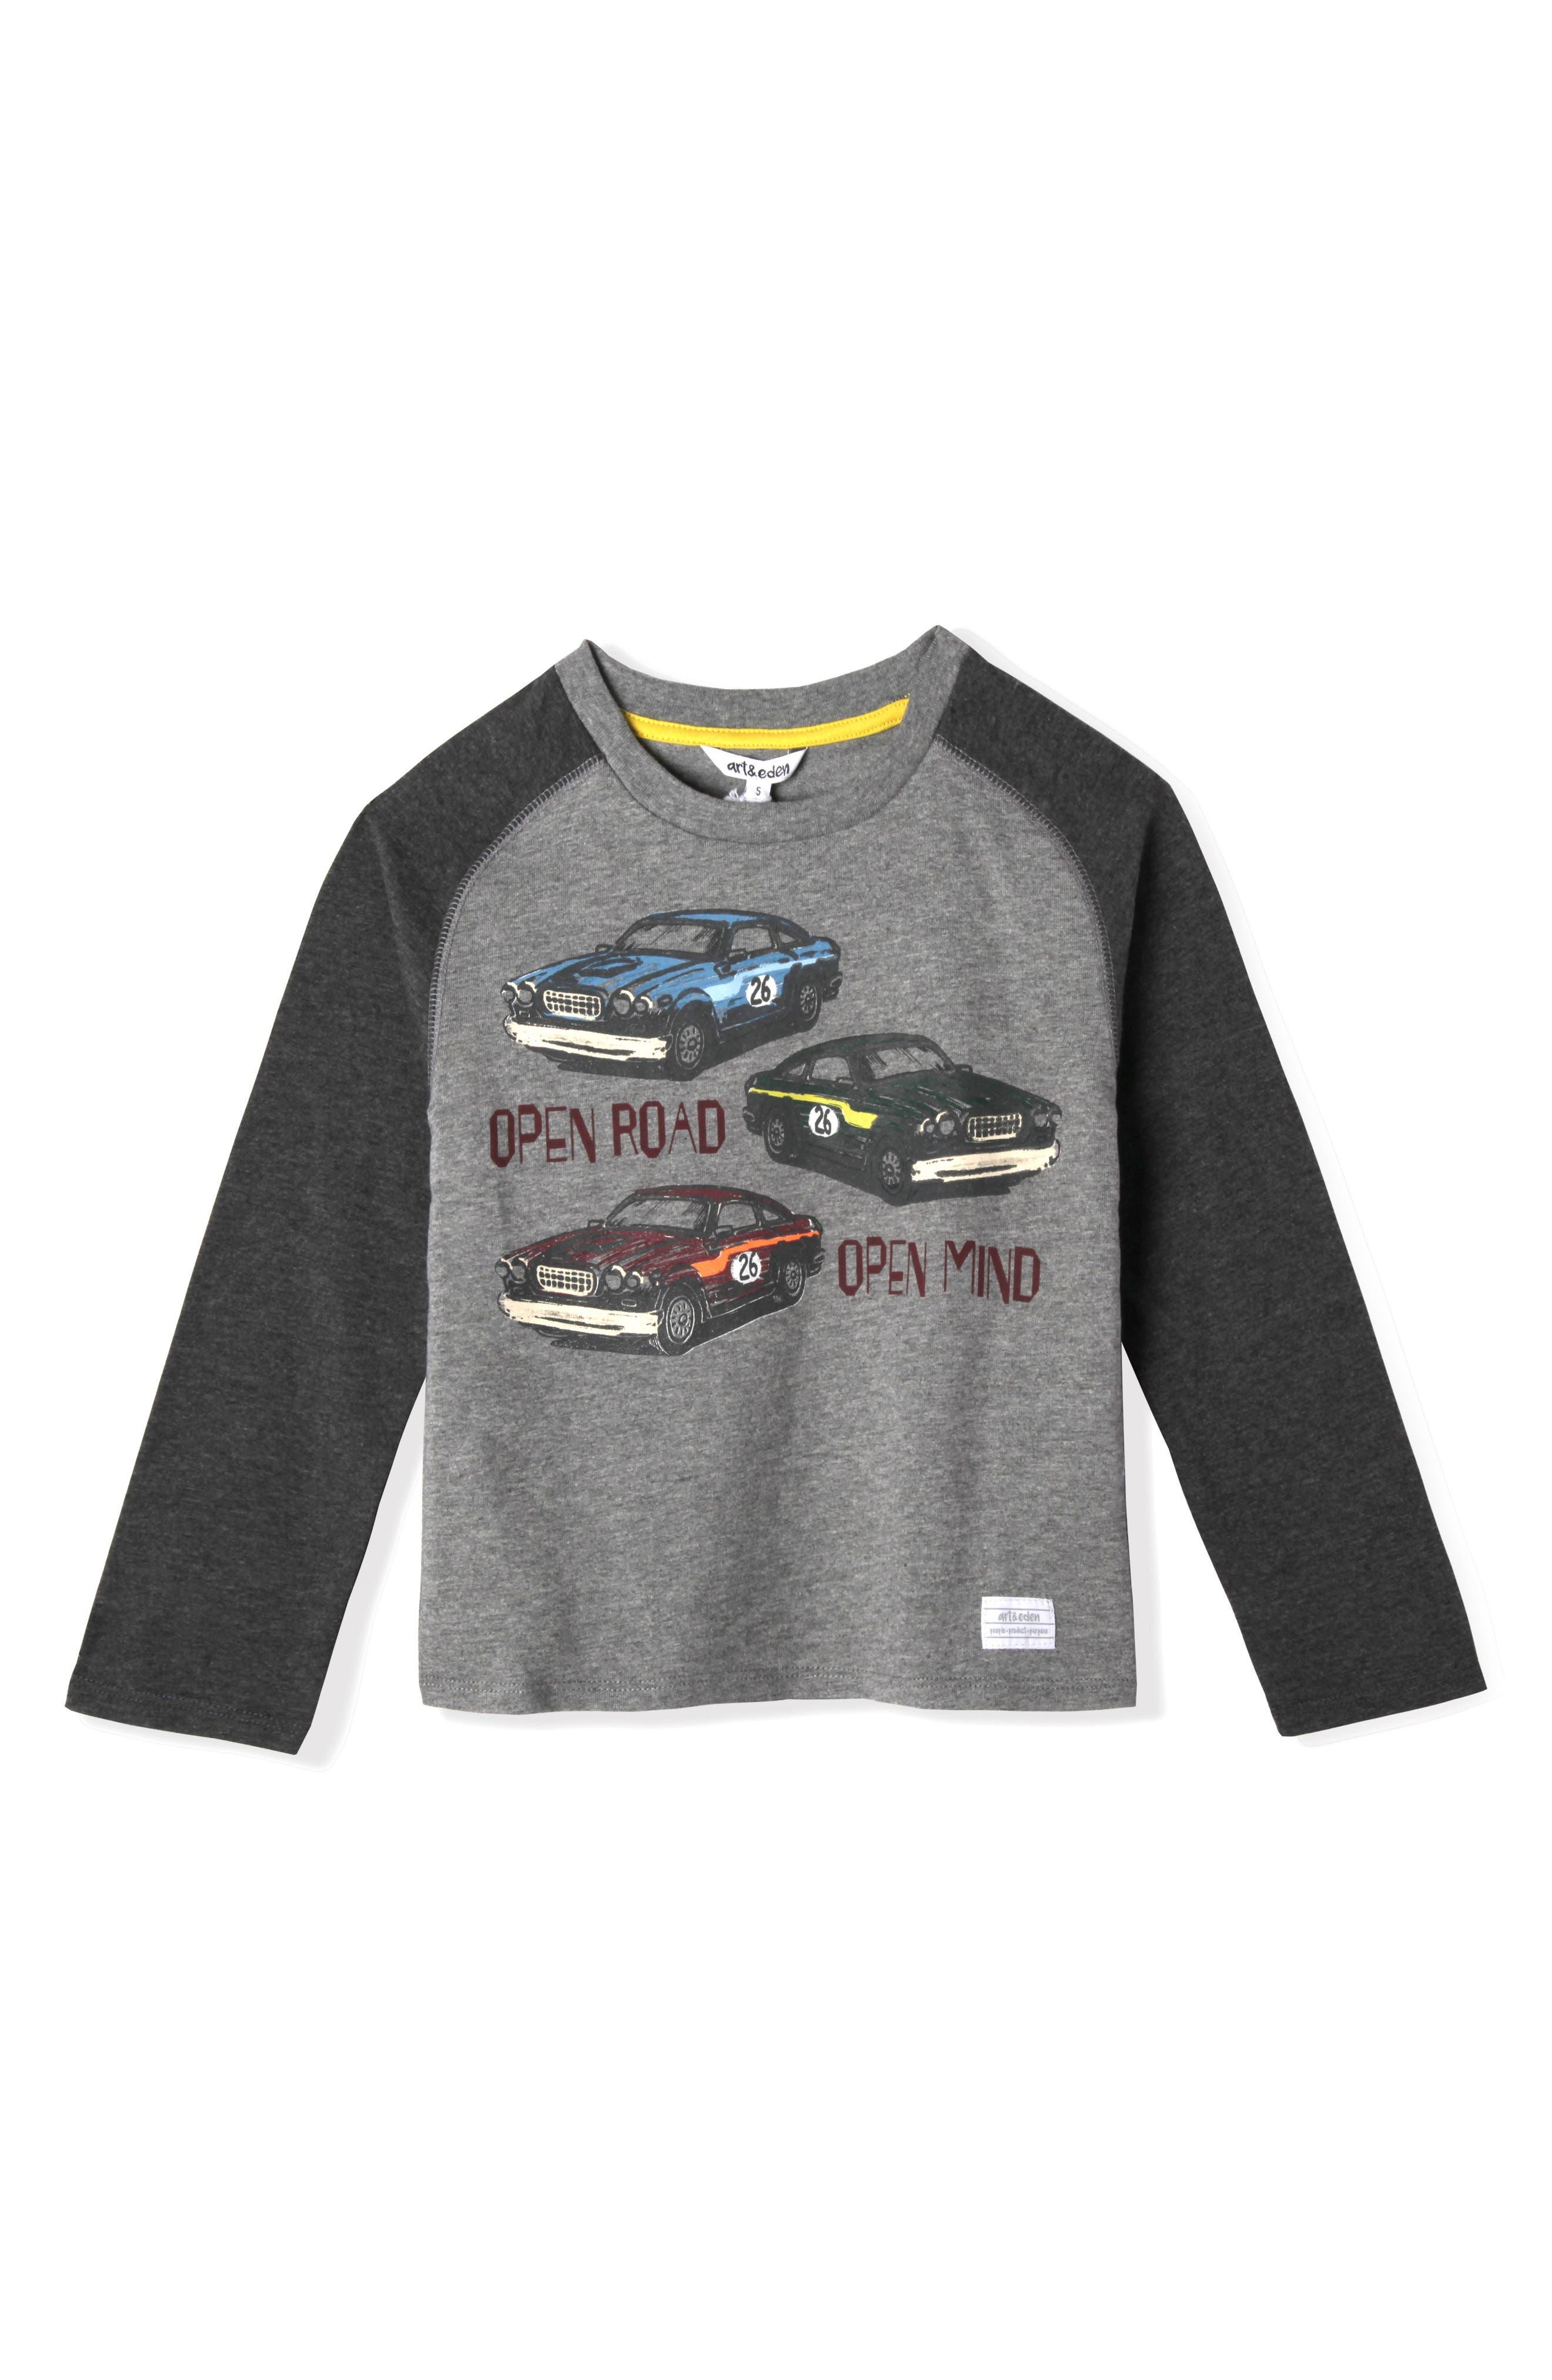 Open Road Organic Cotton T-Shirt,                             Main thumbnail 1, color,                             Grey Heather